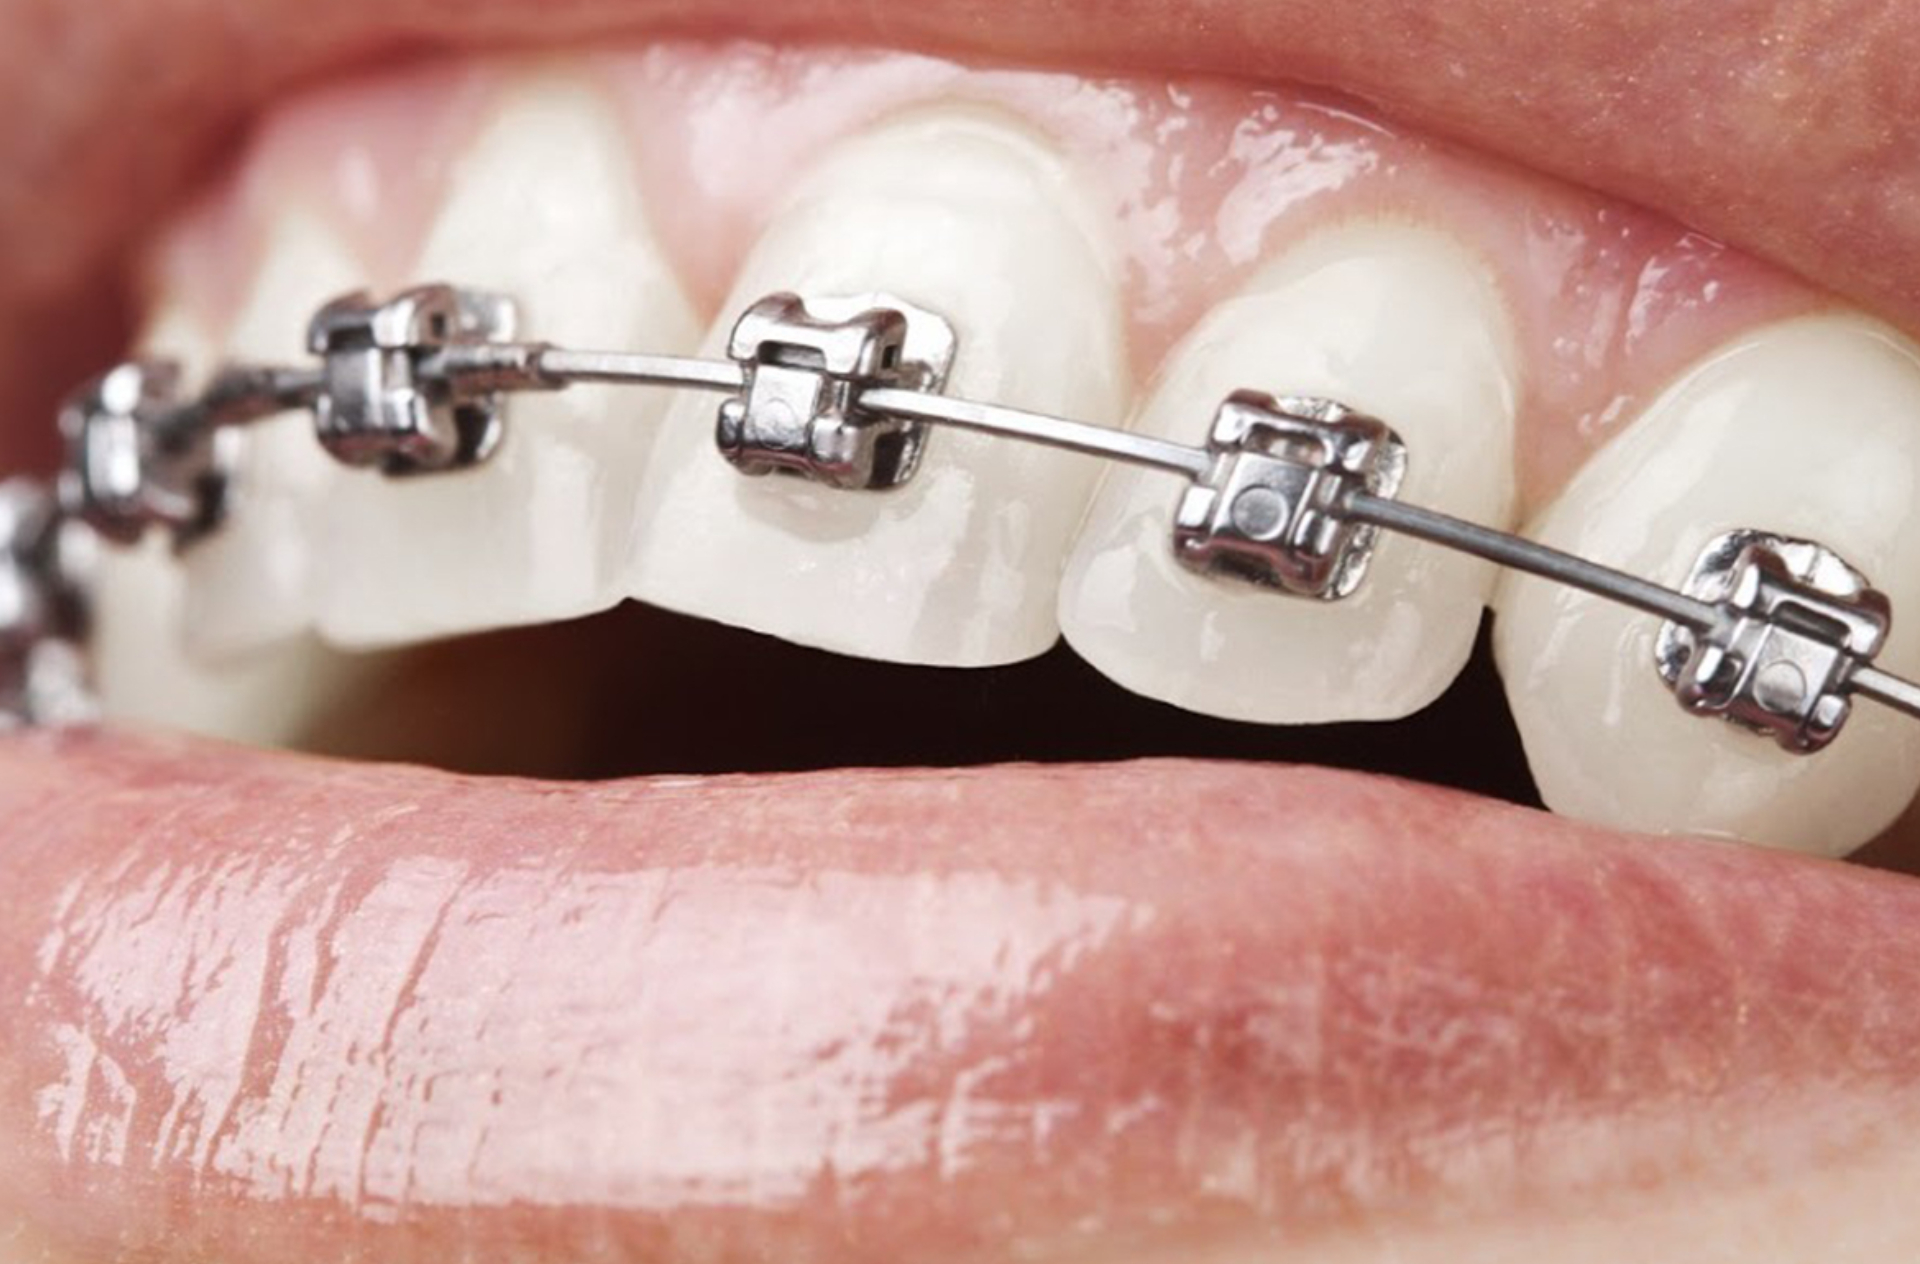 Damon metal orhtodontic device (one jaw)